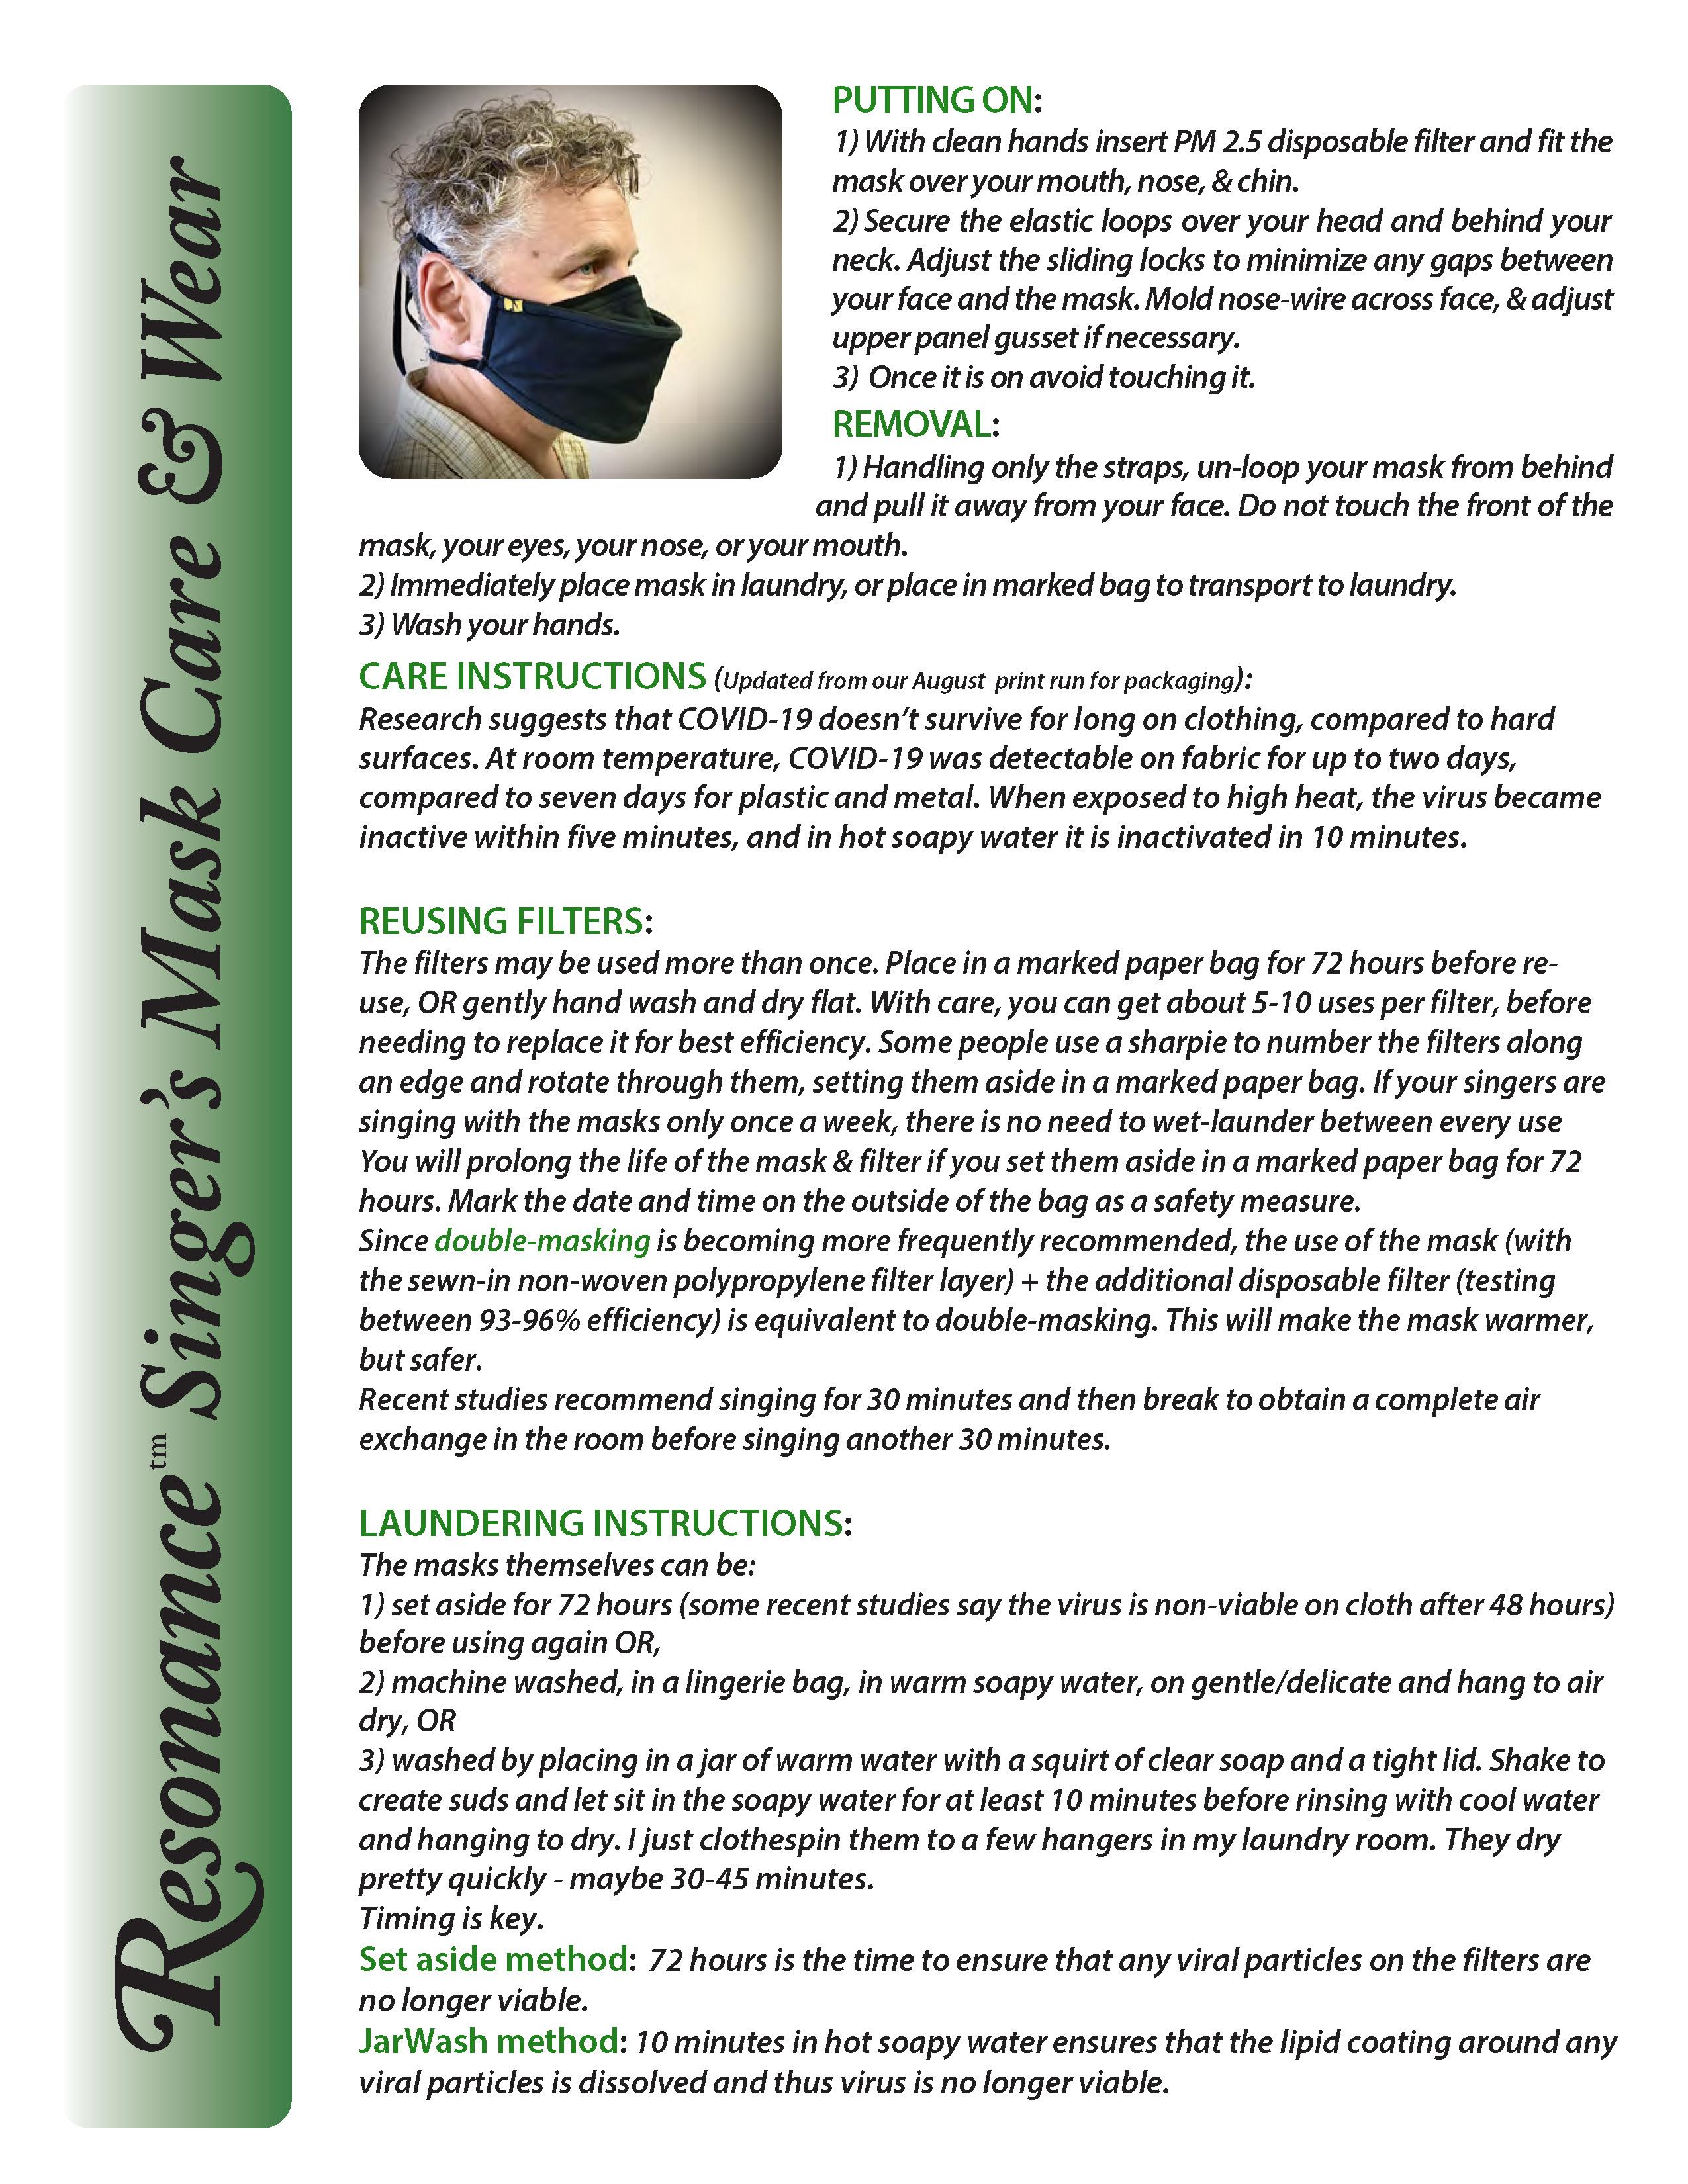 Mask Wear & Care Information